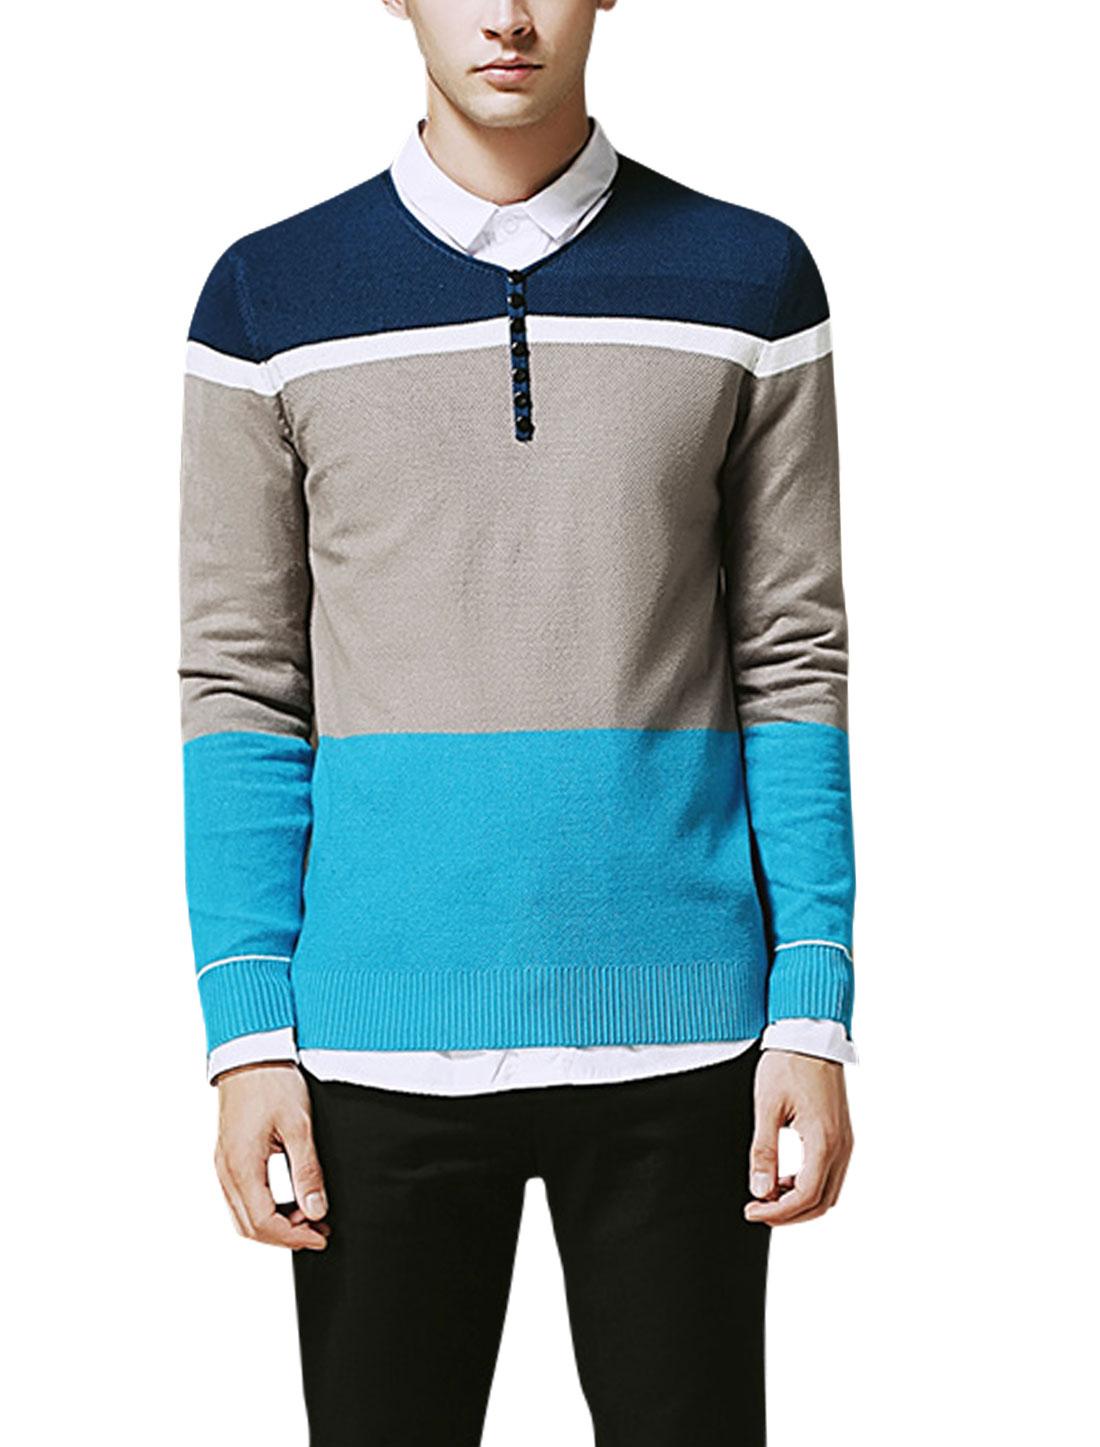 Men V Neck Long Sleeves Color Blocking Knit Shirt Blue Gray M